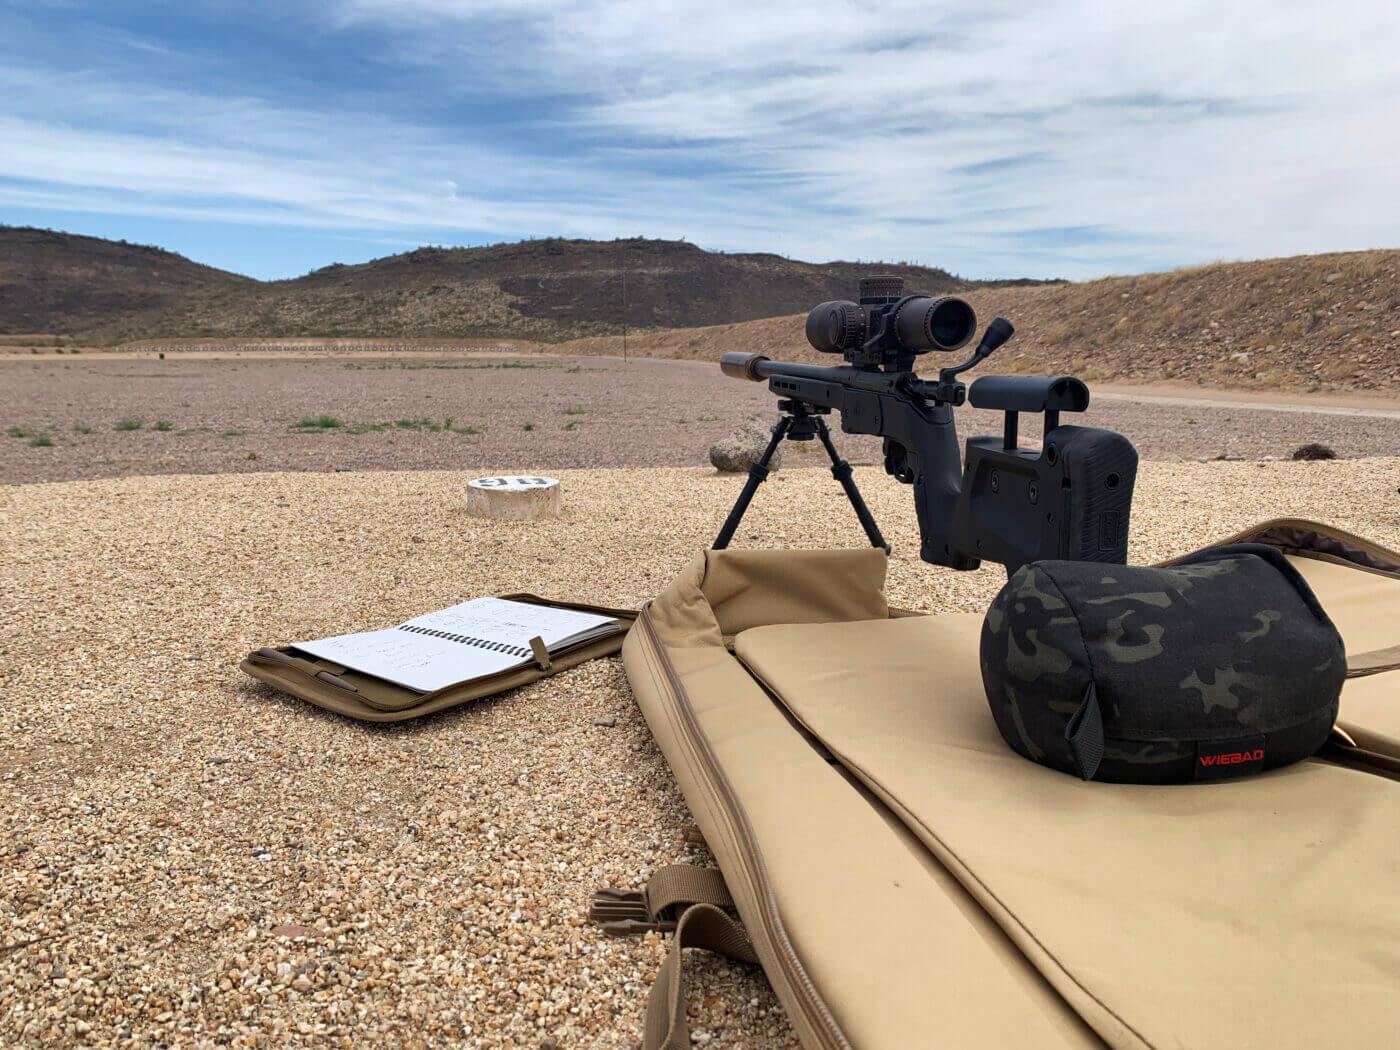 Long range shooting gear